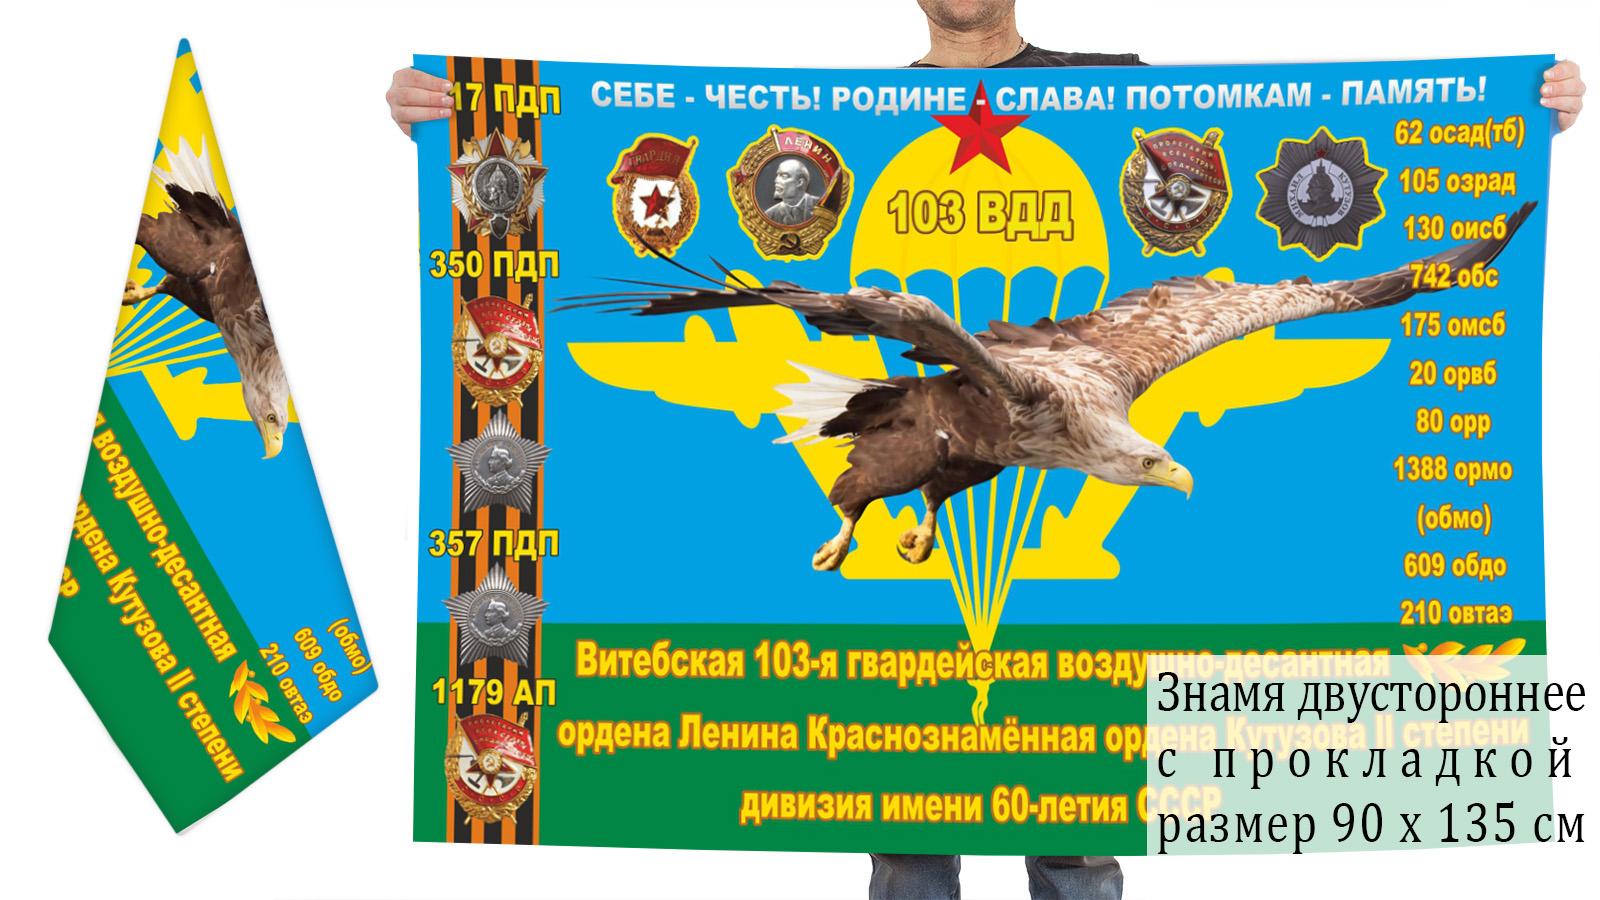 Двусторонний флаг 103 гвардейской воздушно-десантной дивизии